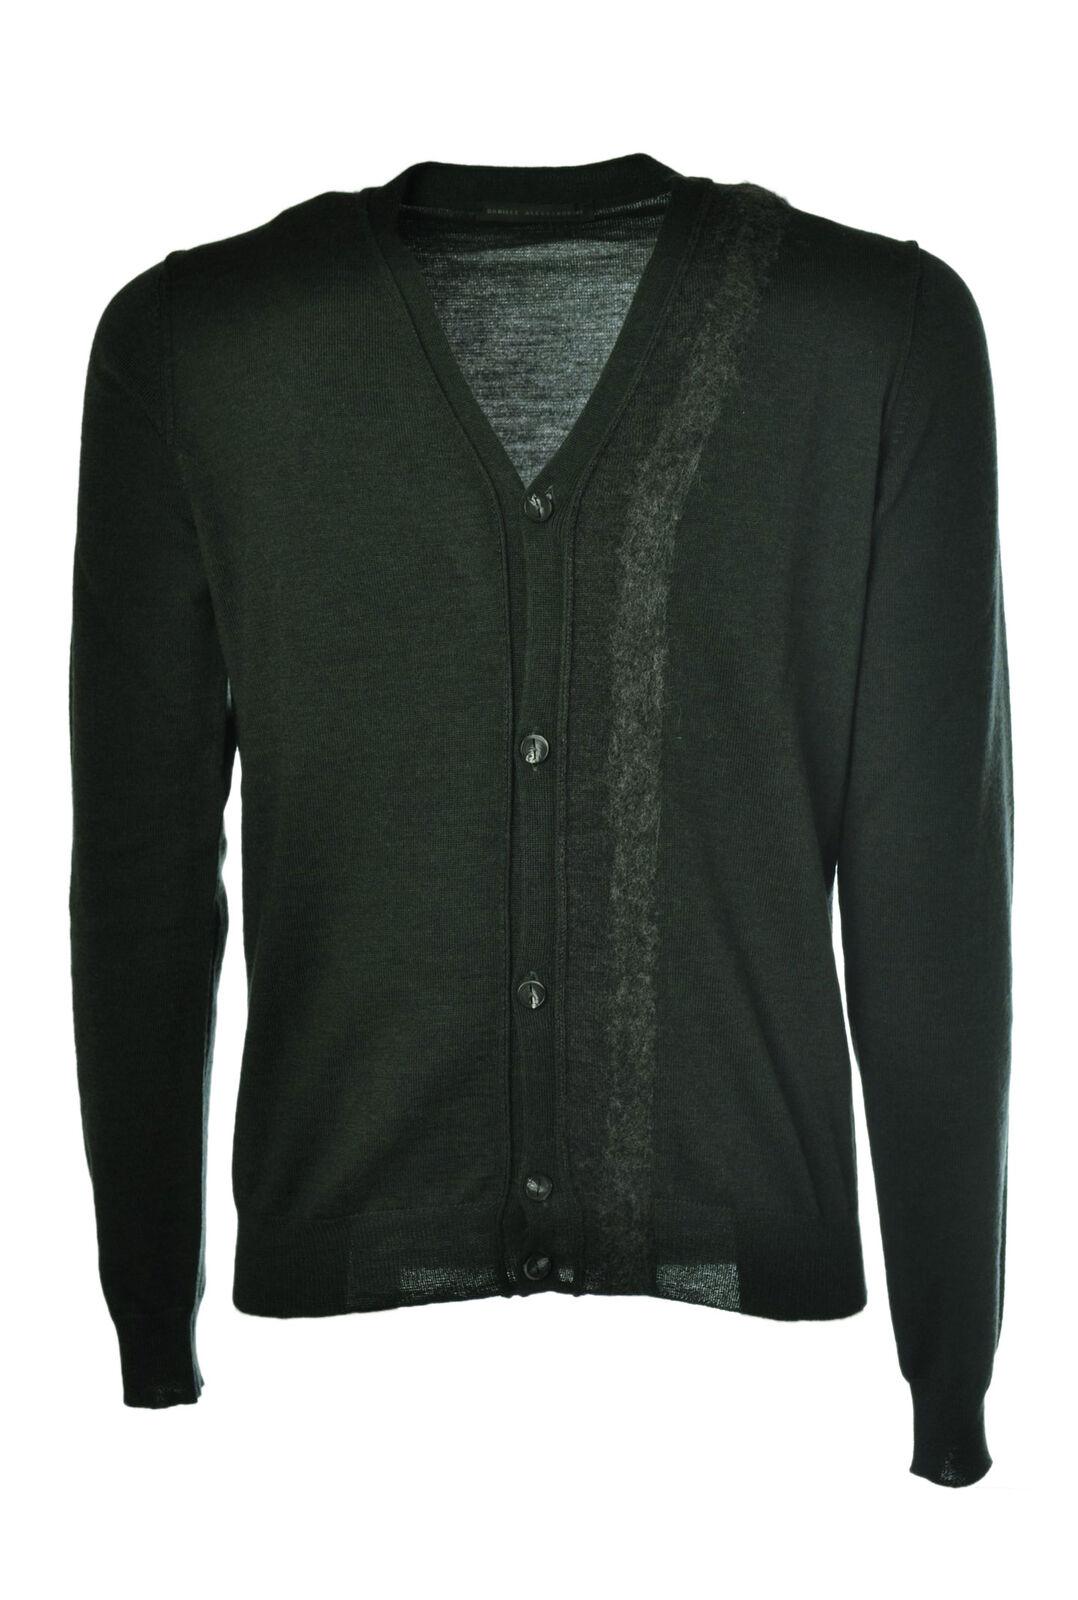 Daniele Alessandrini - Knitwear-Cardigan - Man - Grün - 449815C184058